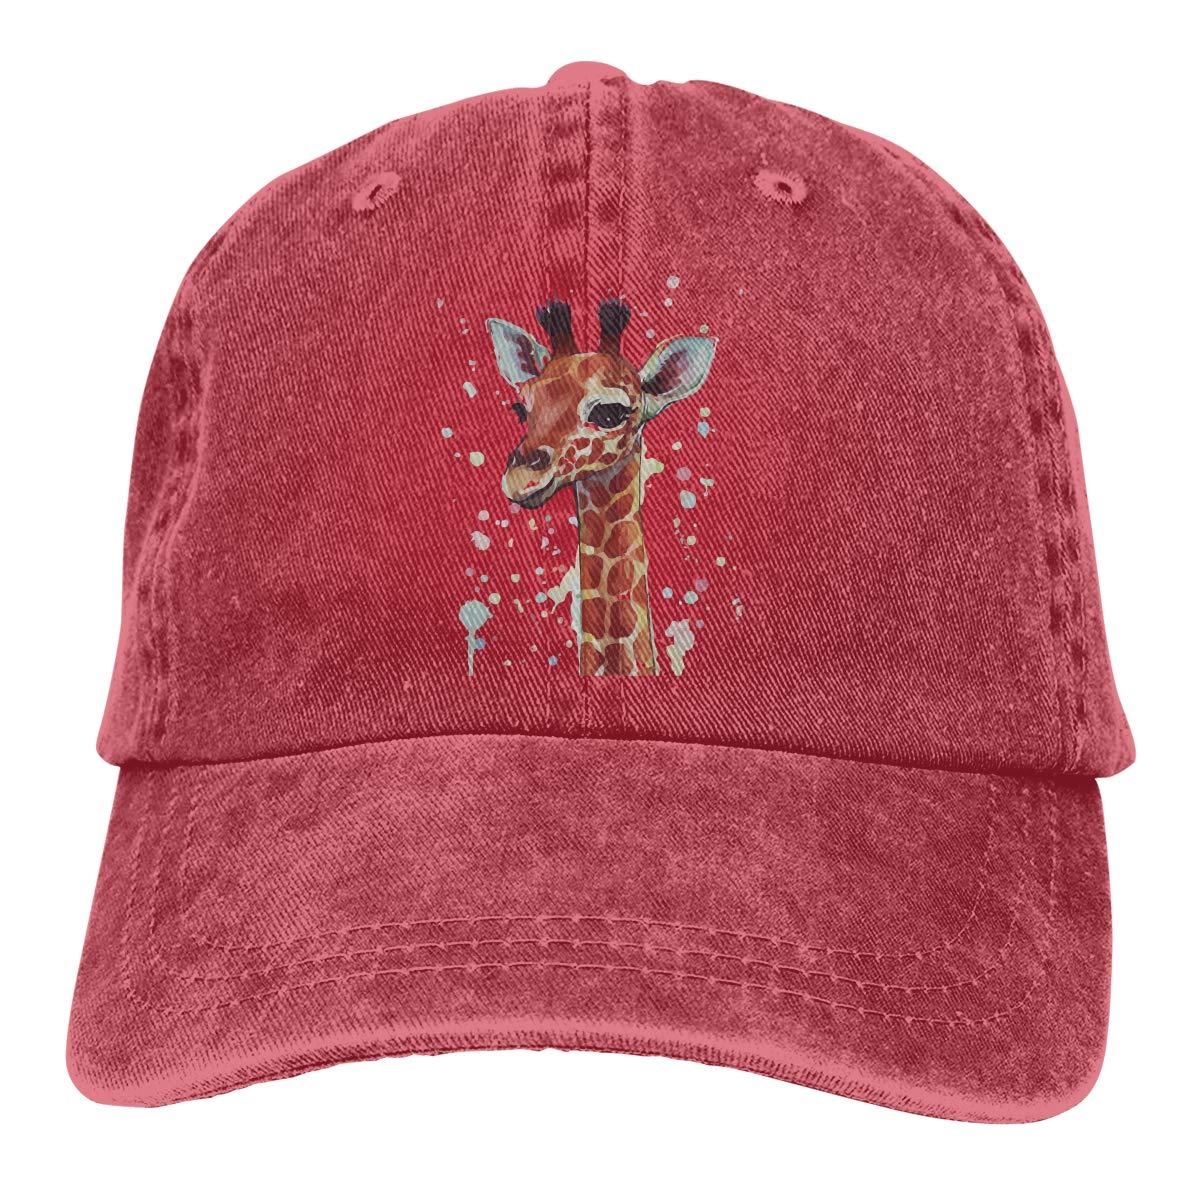 Qbeir Adult Unisex Cowboy Cap Adjustable Hat Waterproof Giraffe Painting Cotton Denim